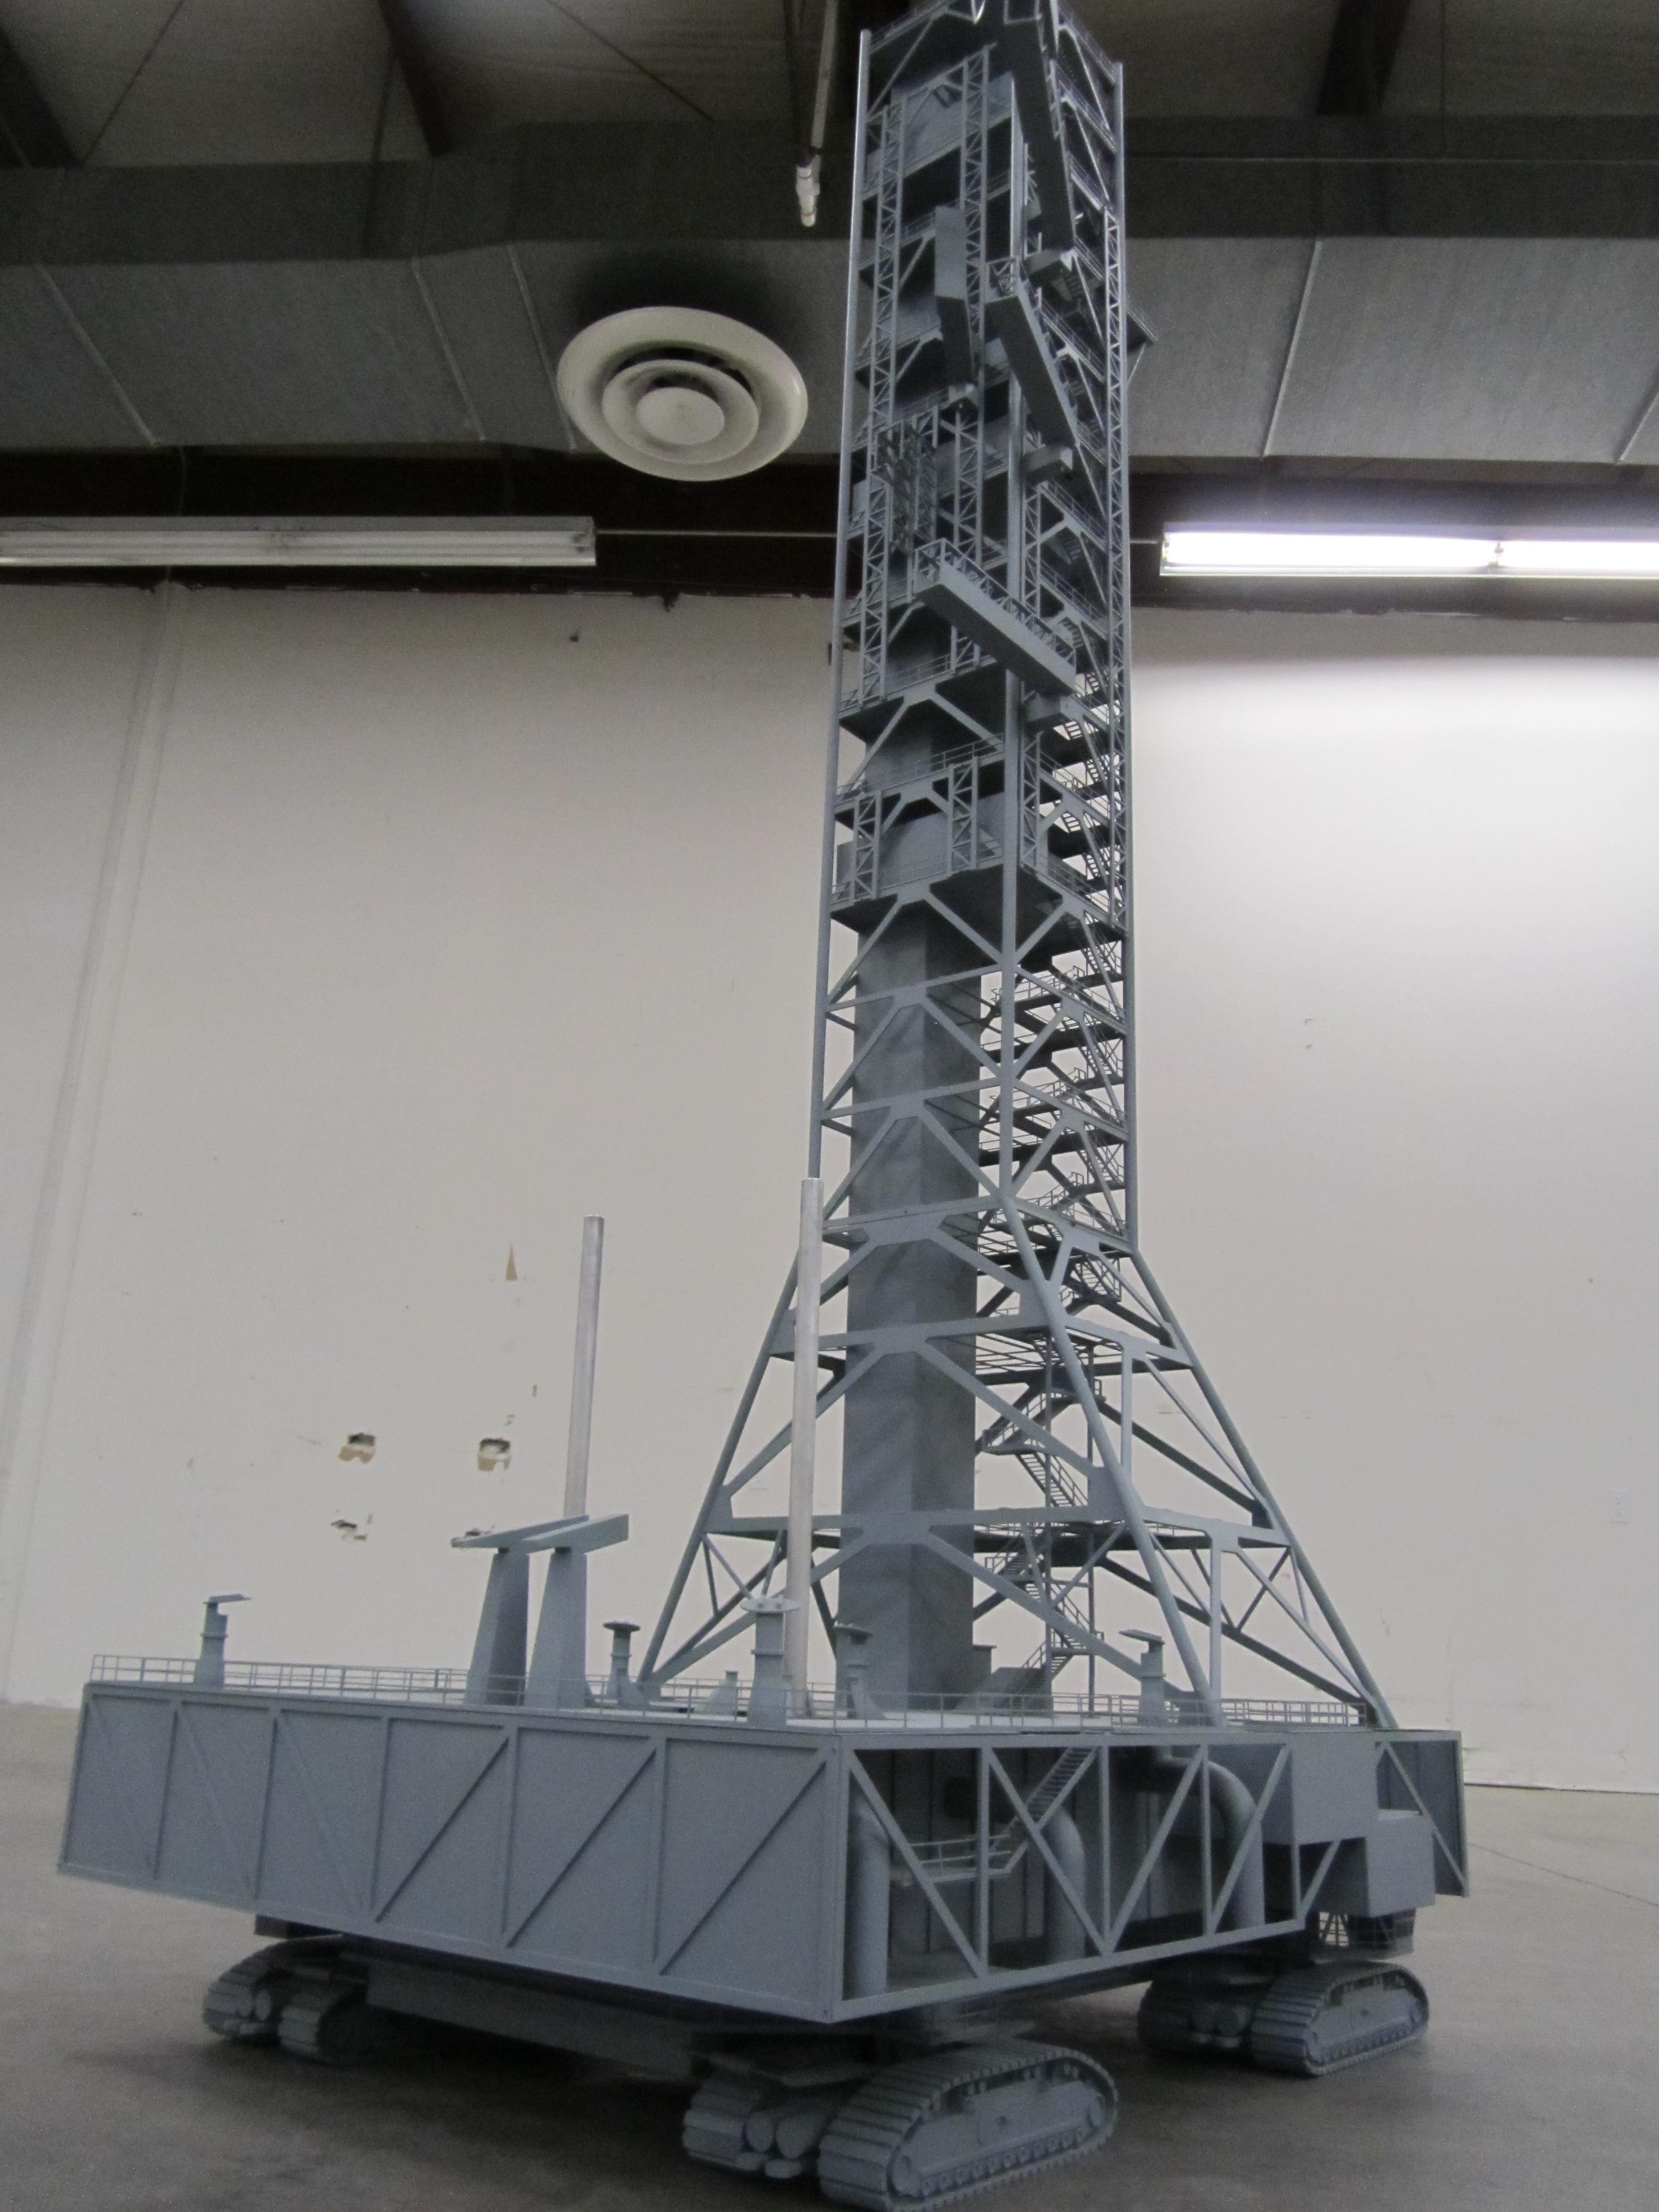 rocket launch pad model - KiwiMill